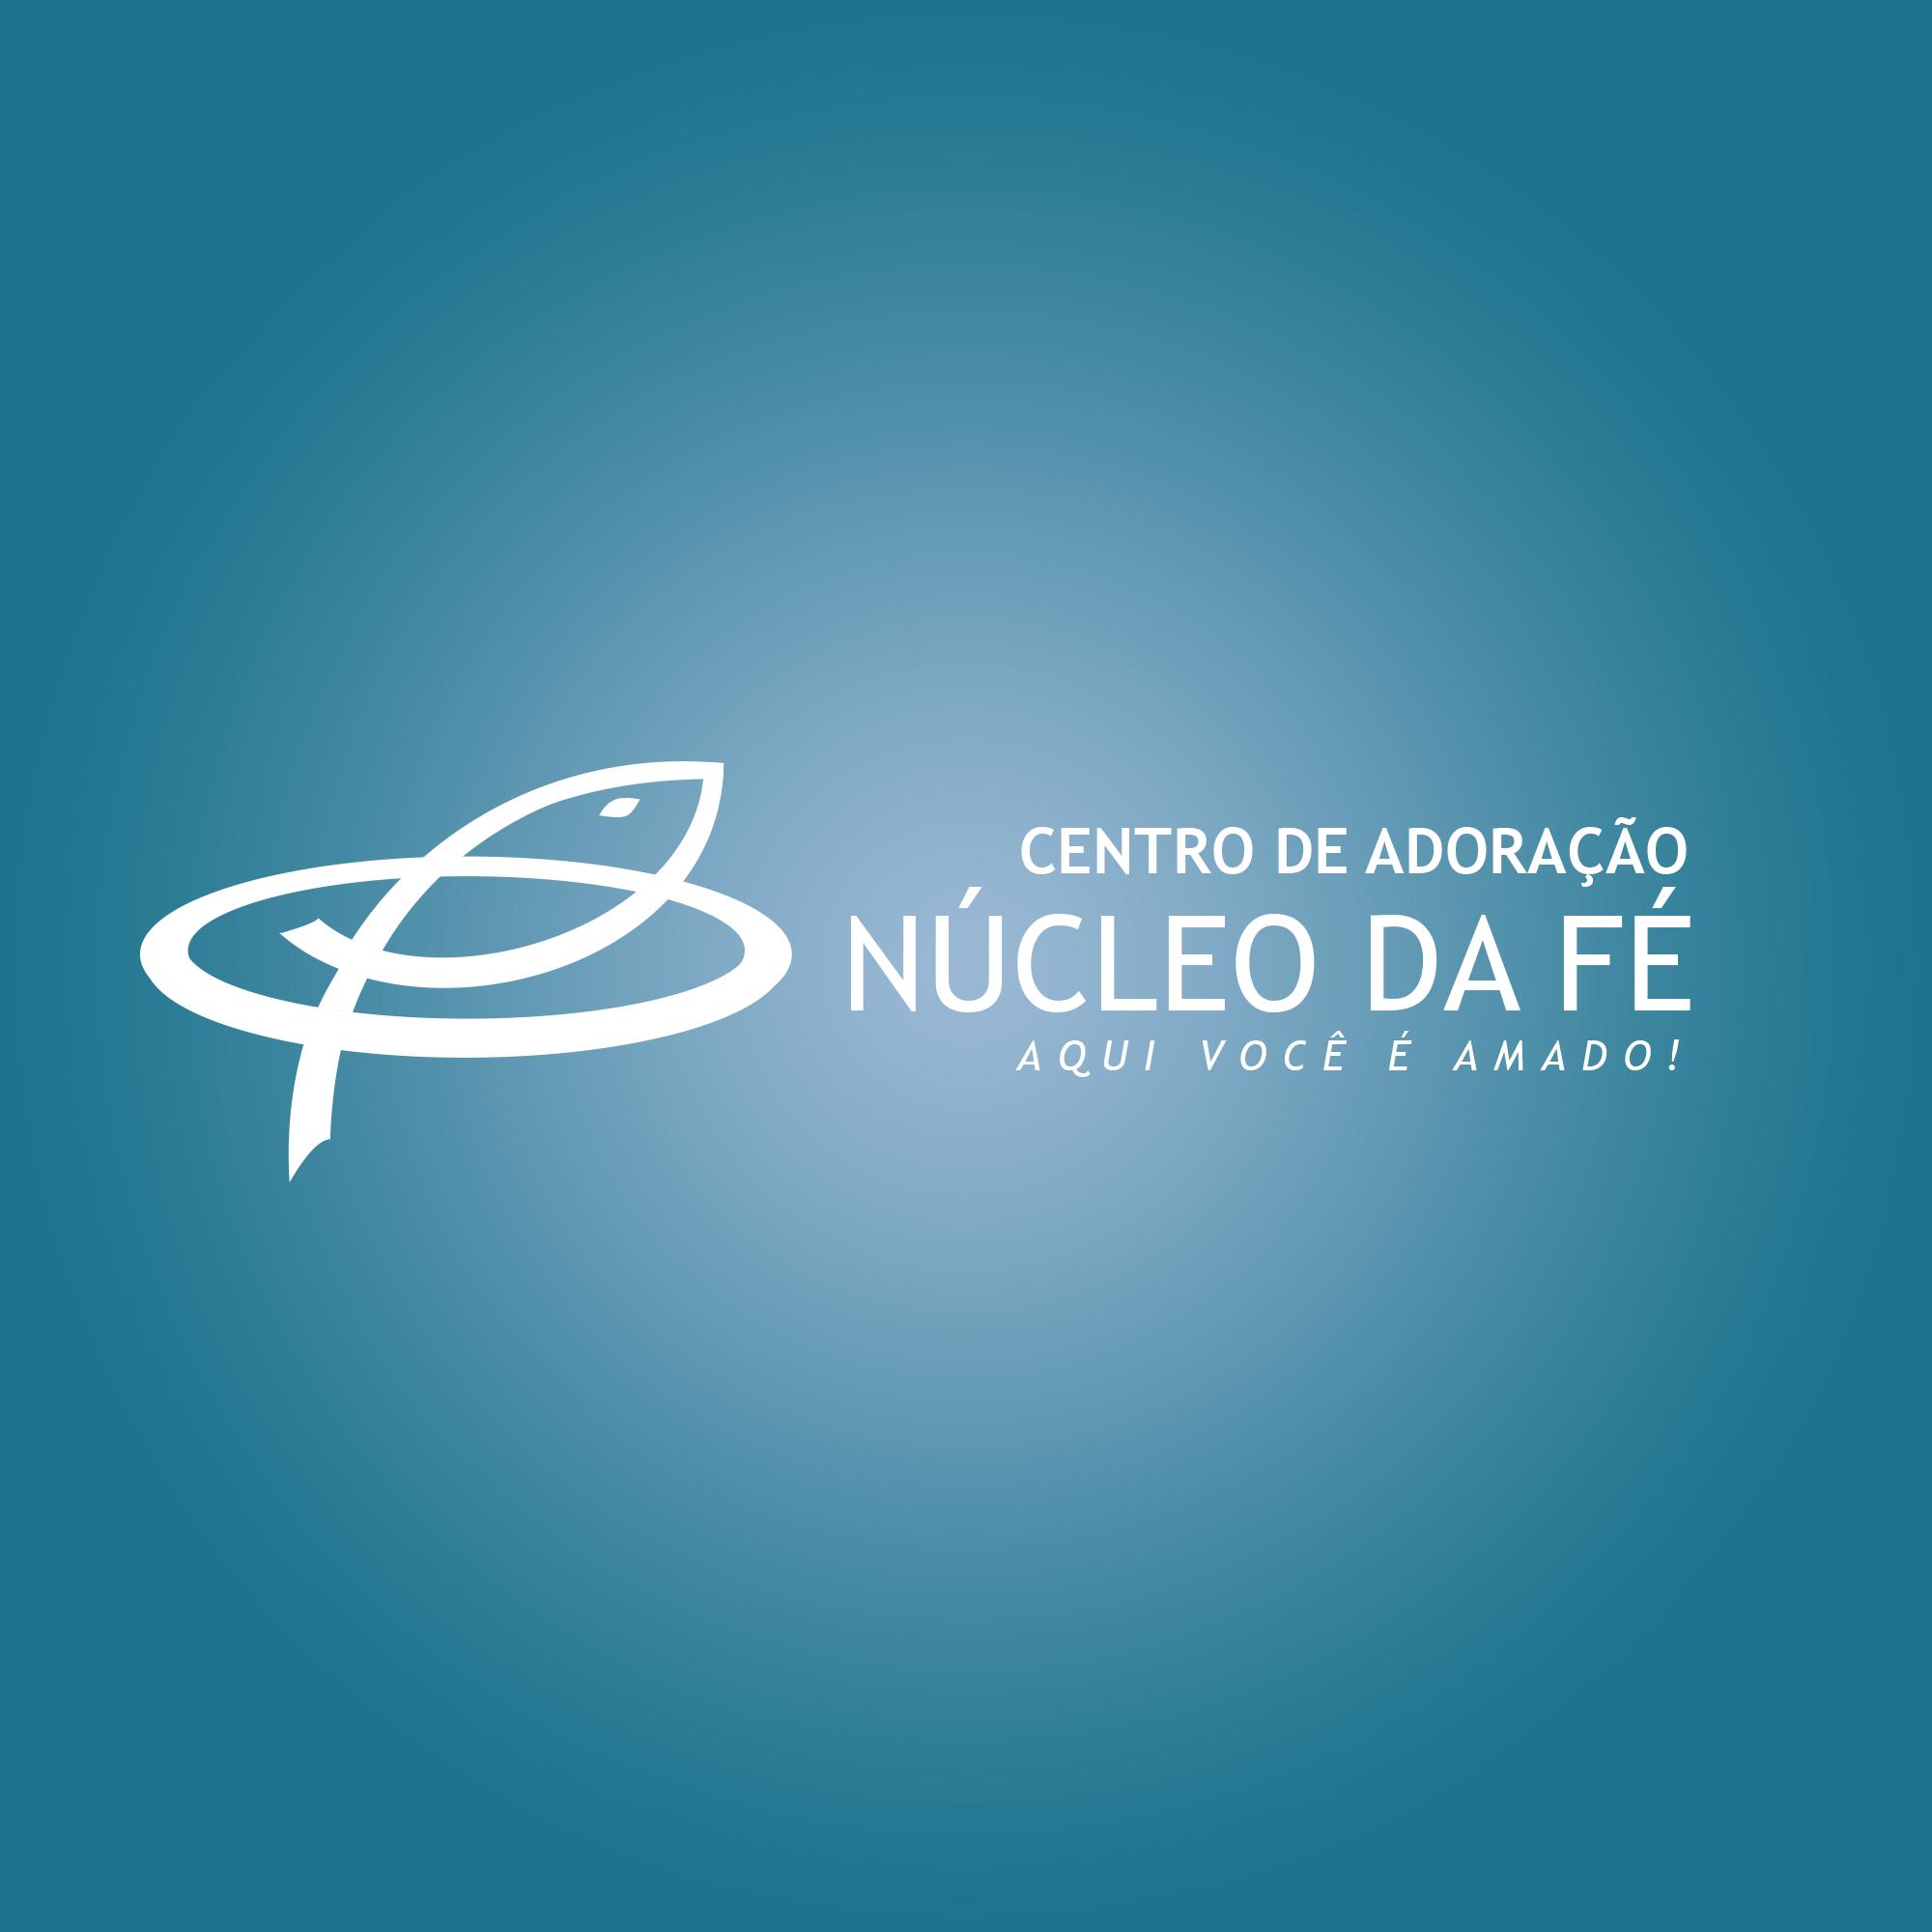 Núcleo da Fé